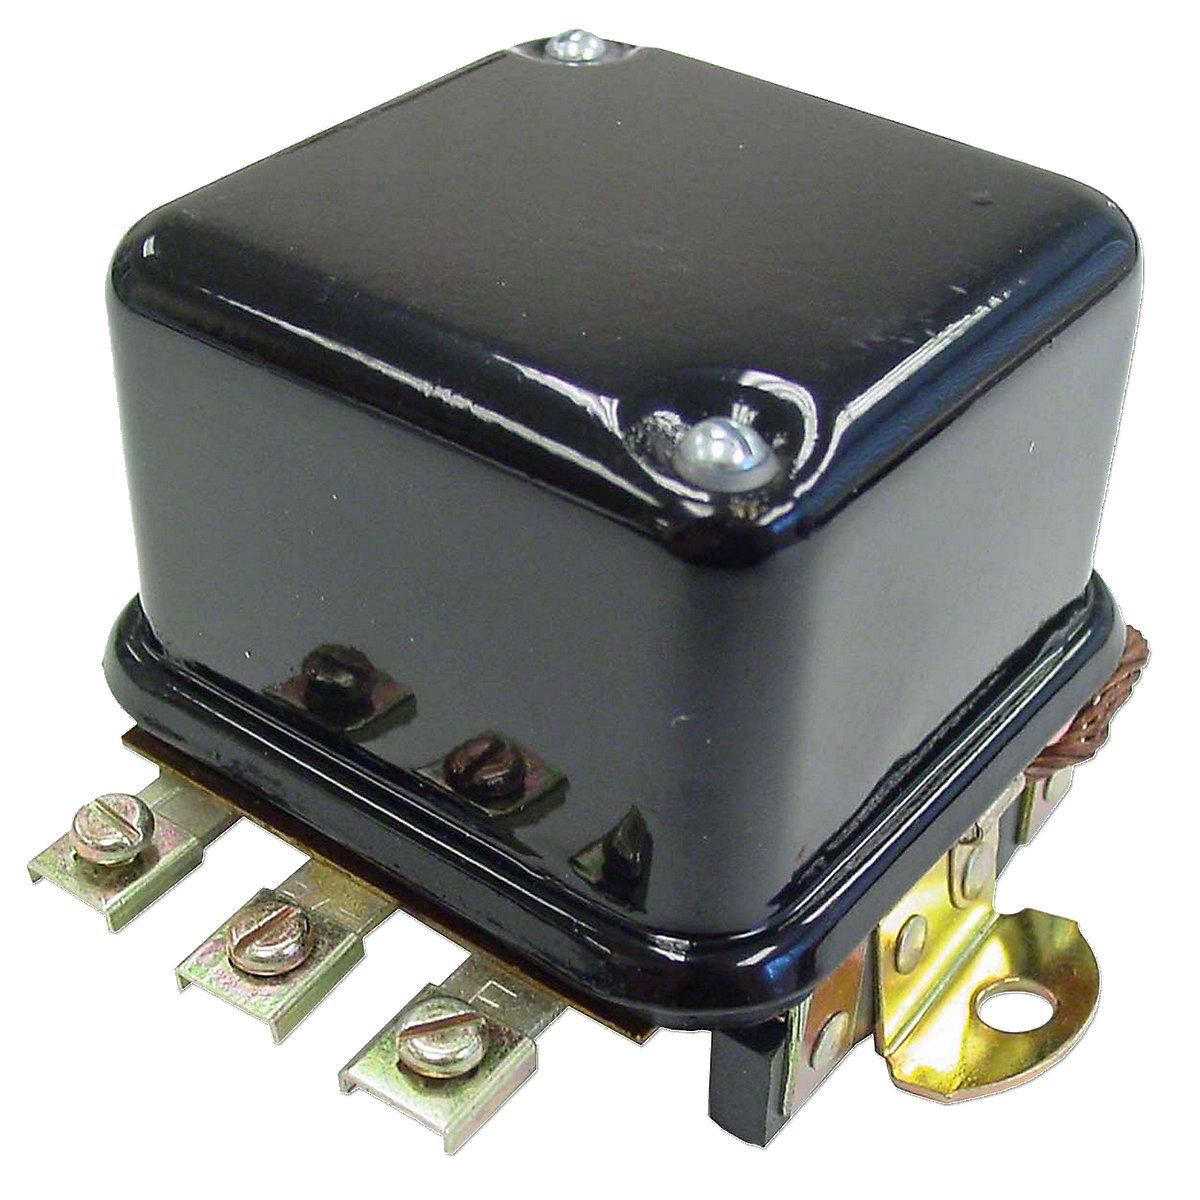 12 Volt Base Mount Voltage Regulator For Massey Ferguson: 40, FE35, TO35, 50, 135 Except With Perkins Gas Engine, 150, 165, 175, 180, 35, 65, 85, 88, Super 90, Massey Harris: 50.